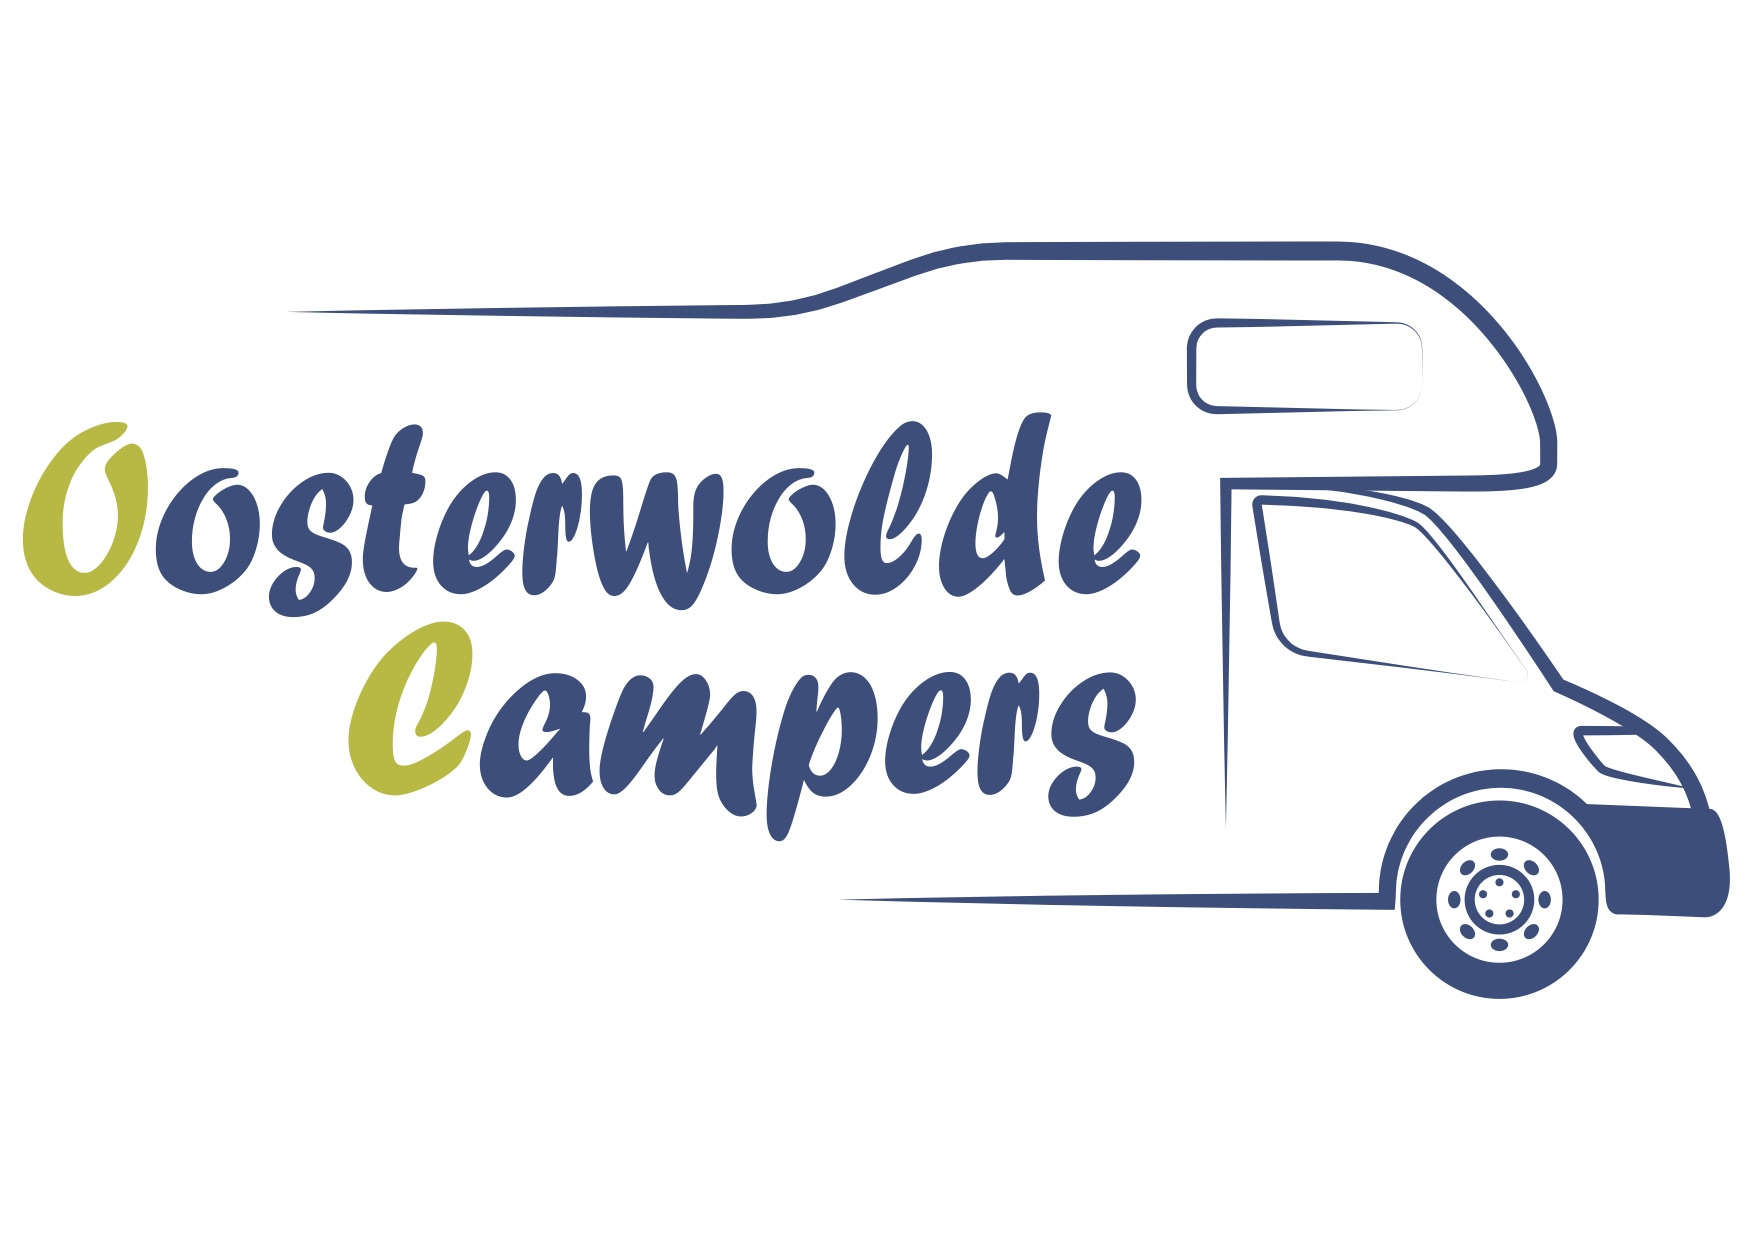 Oosterwolde Campers